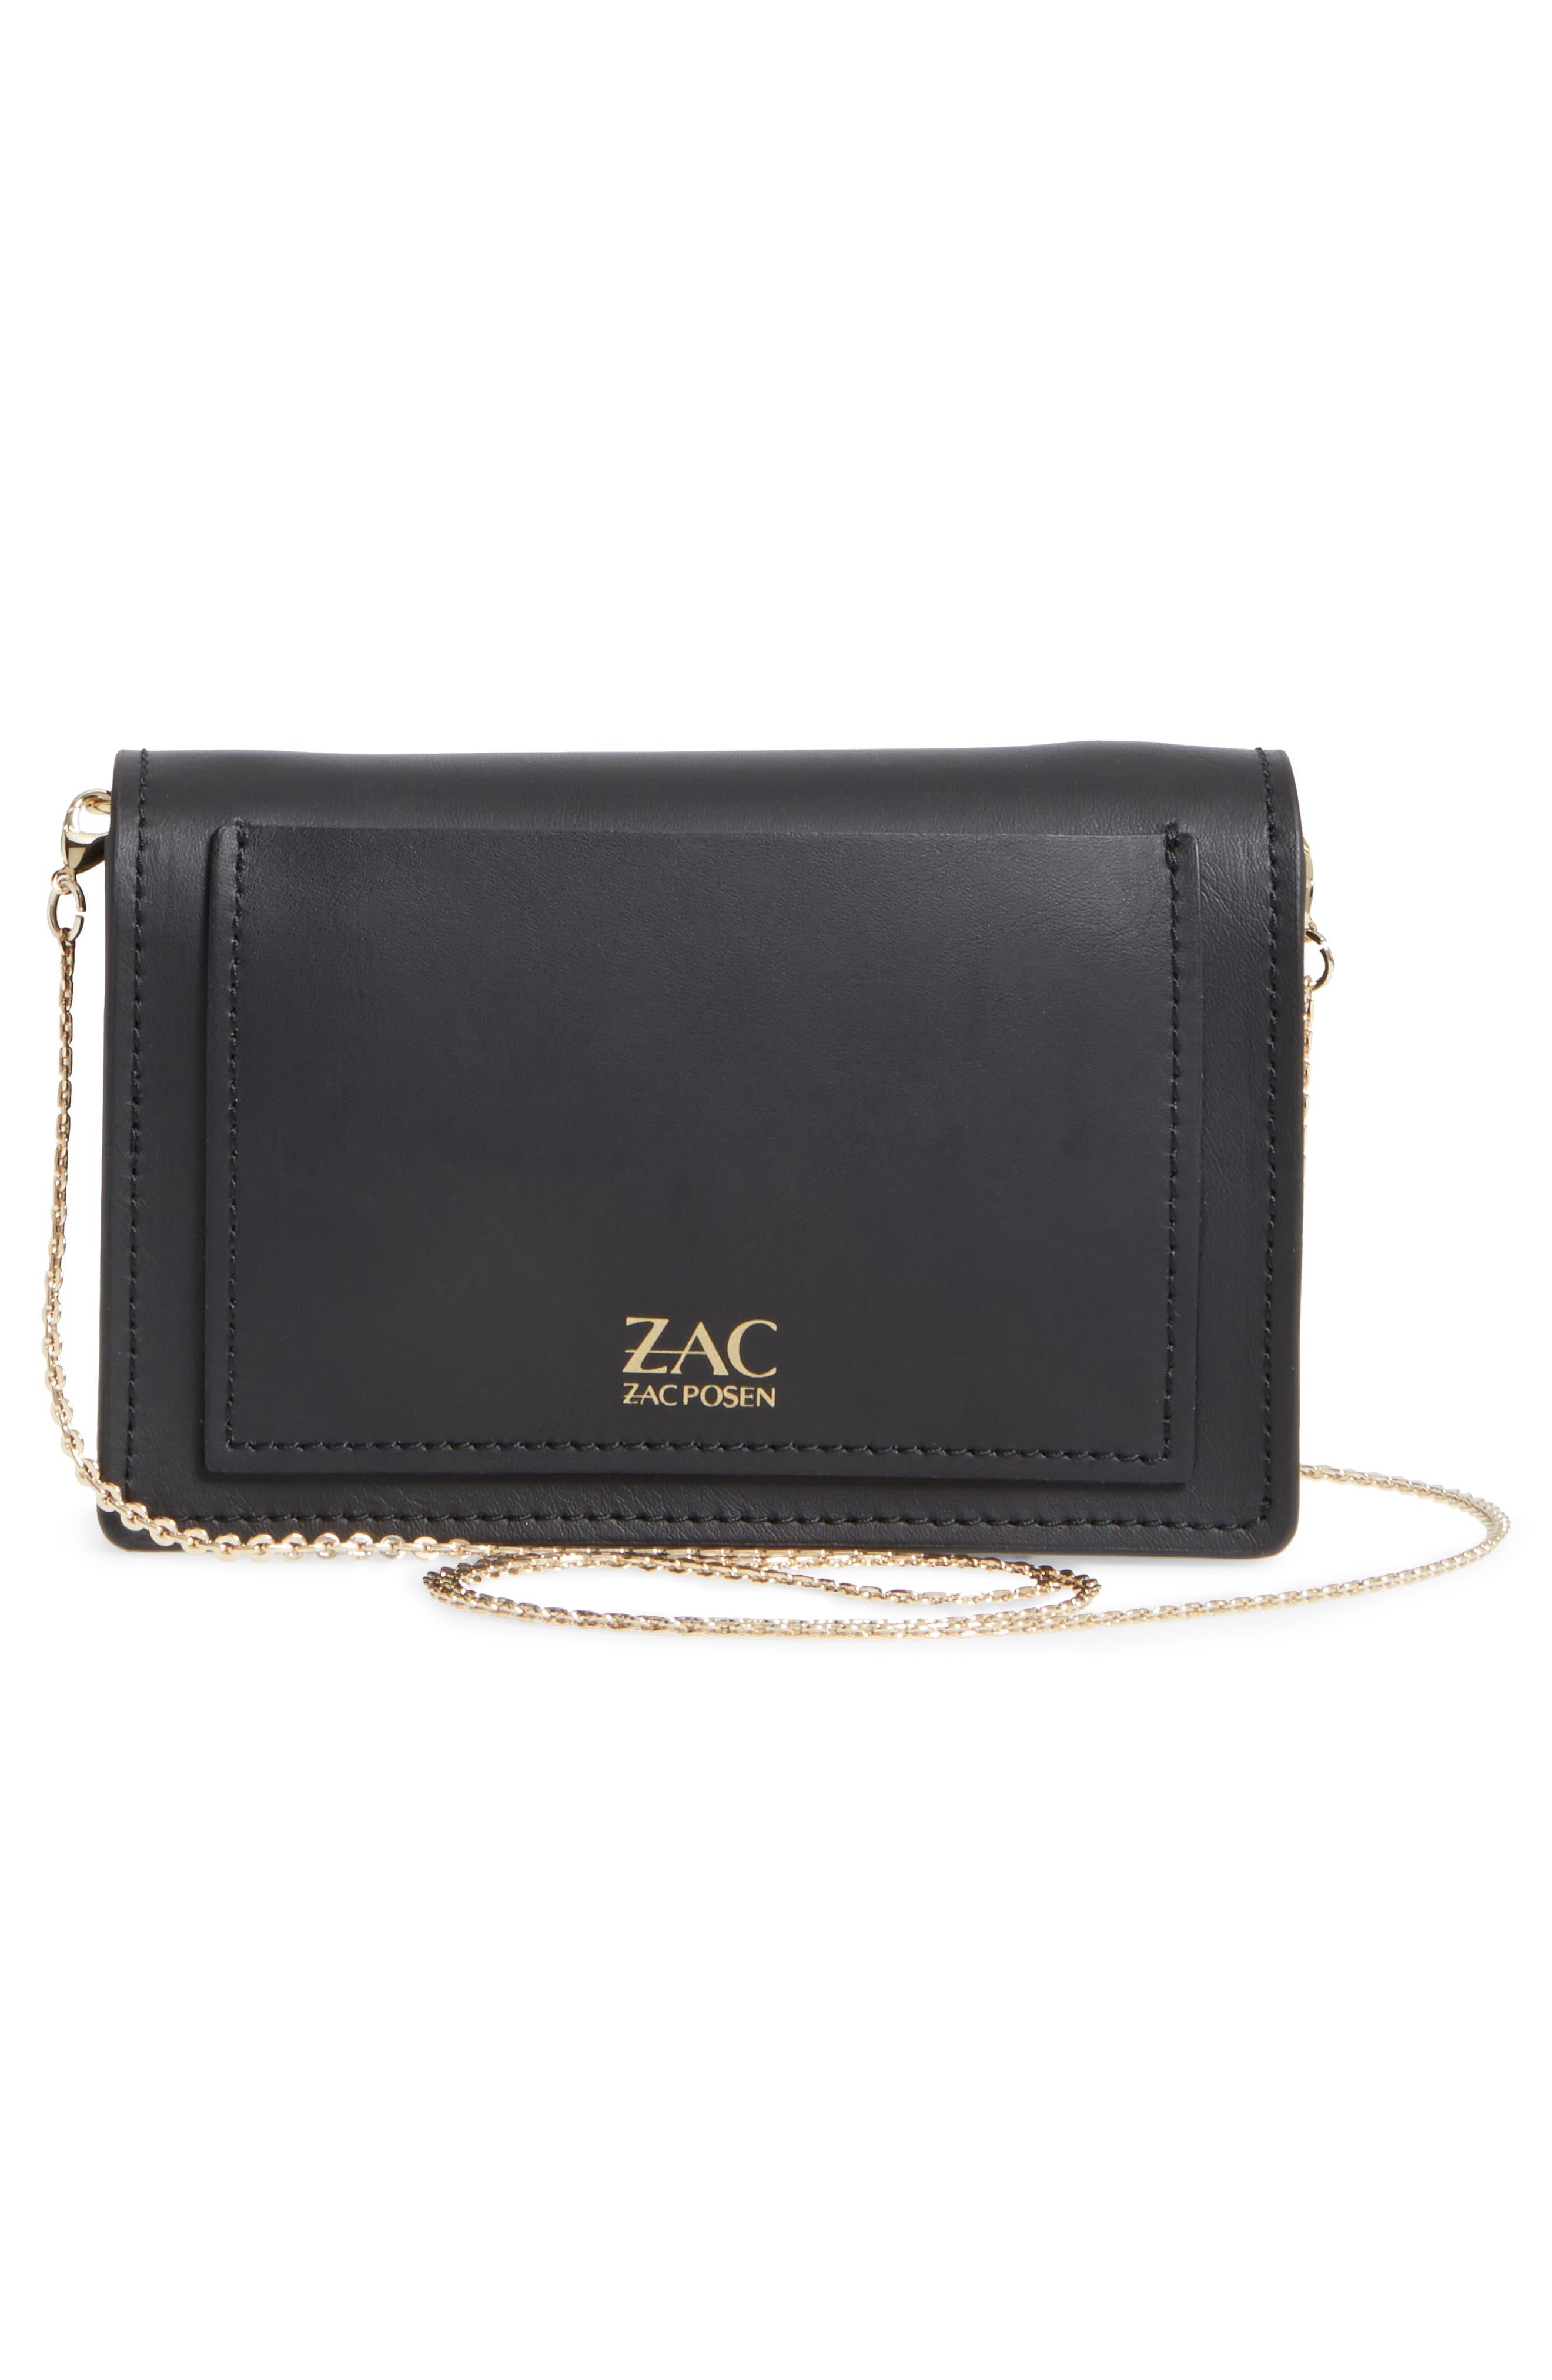 ZAC Zac Posen Earthette Leather Accordion Bag,                             Alternate thumbnail 3, color,                             001